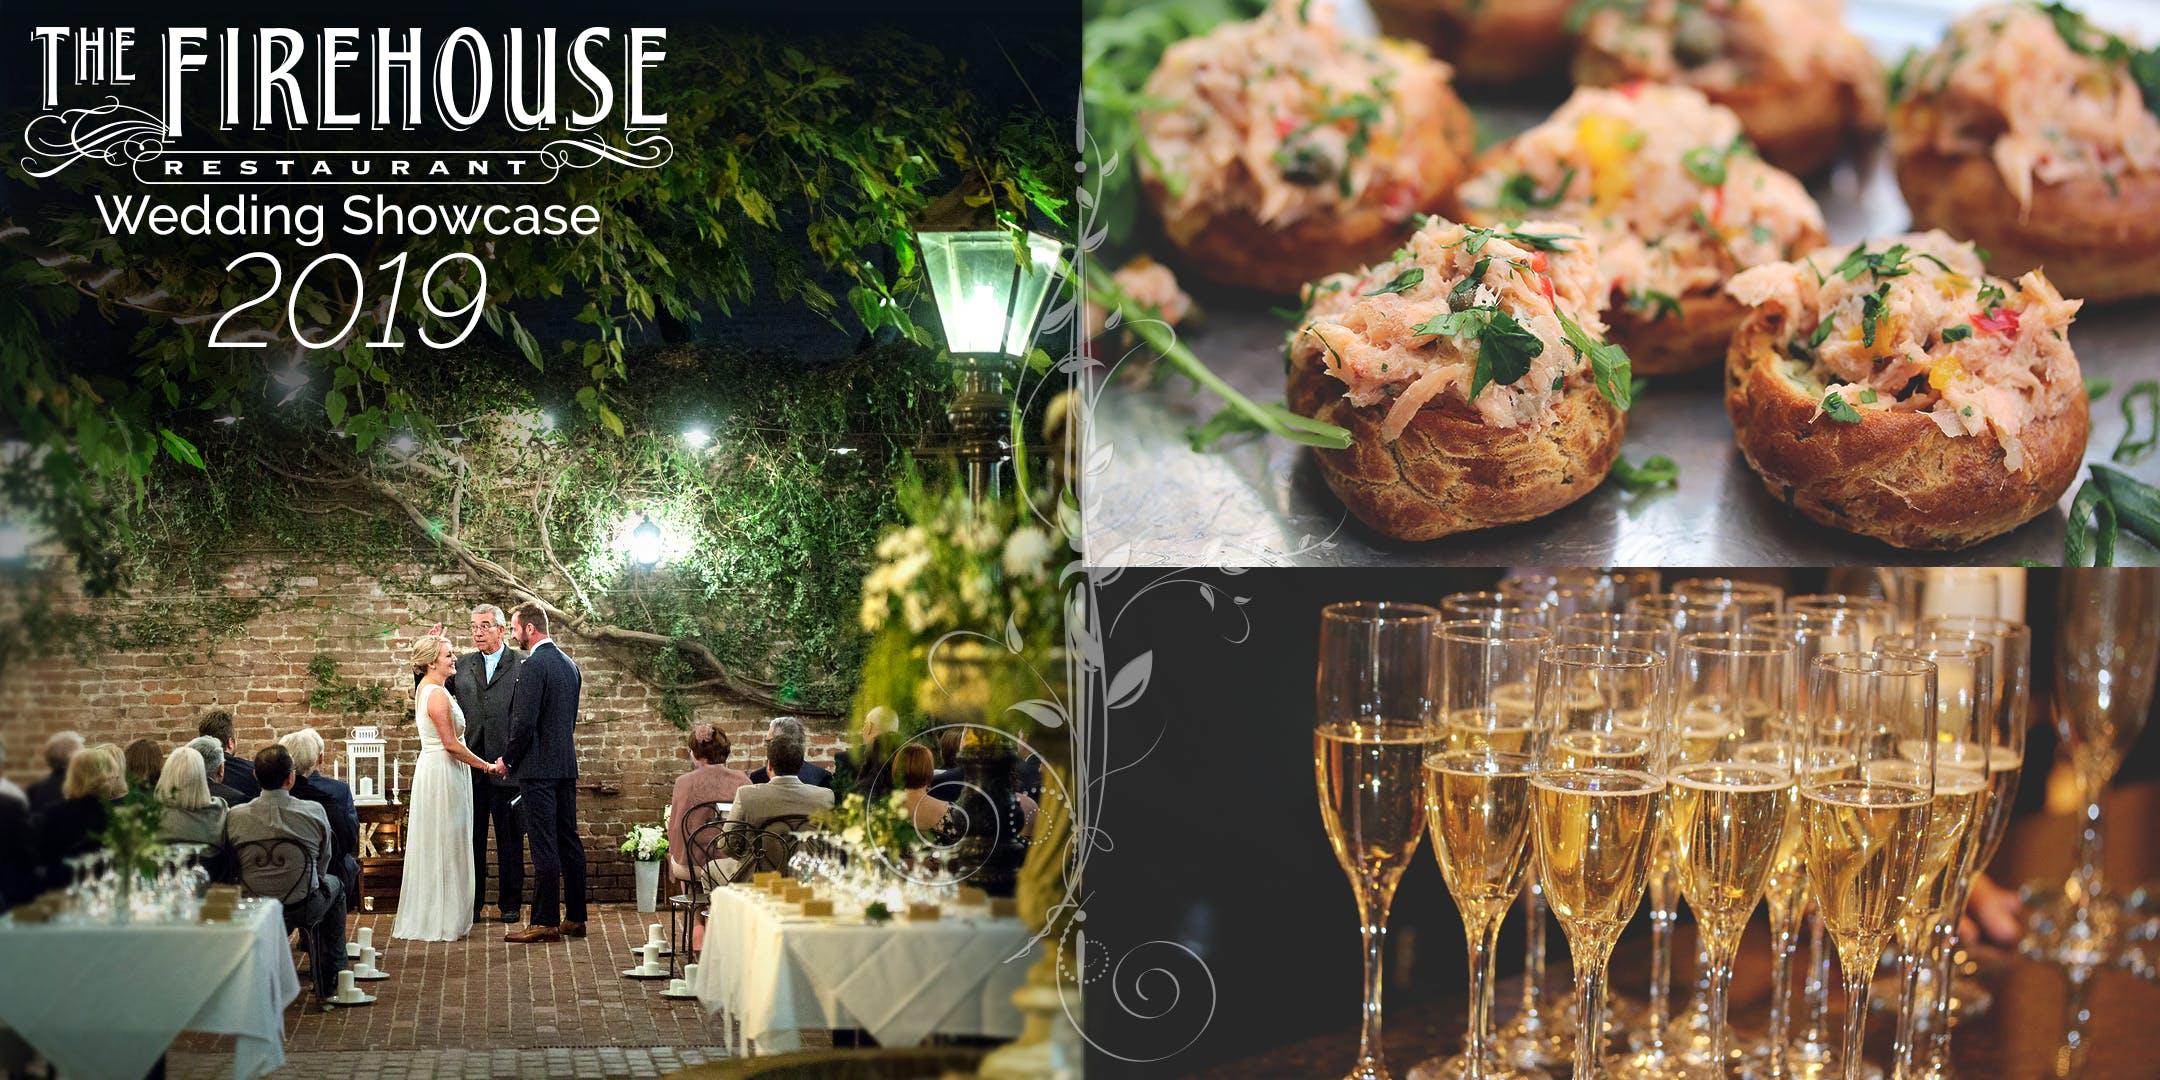 The Firehouse Wedding Showcase 2019